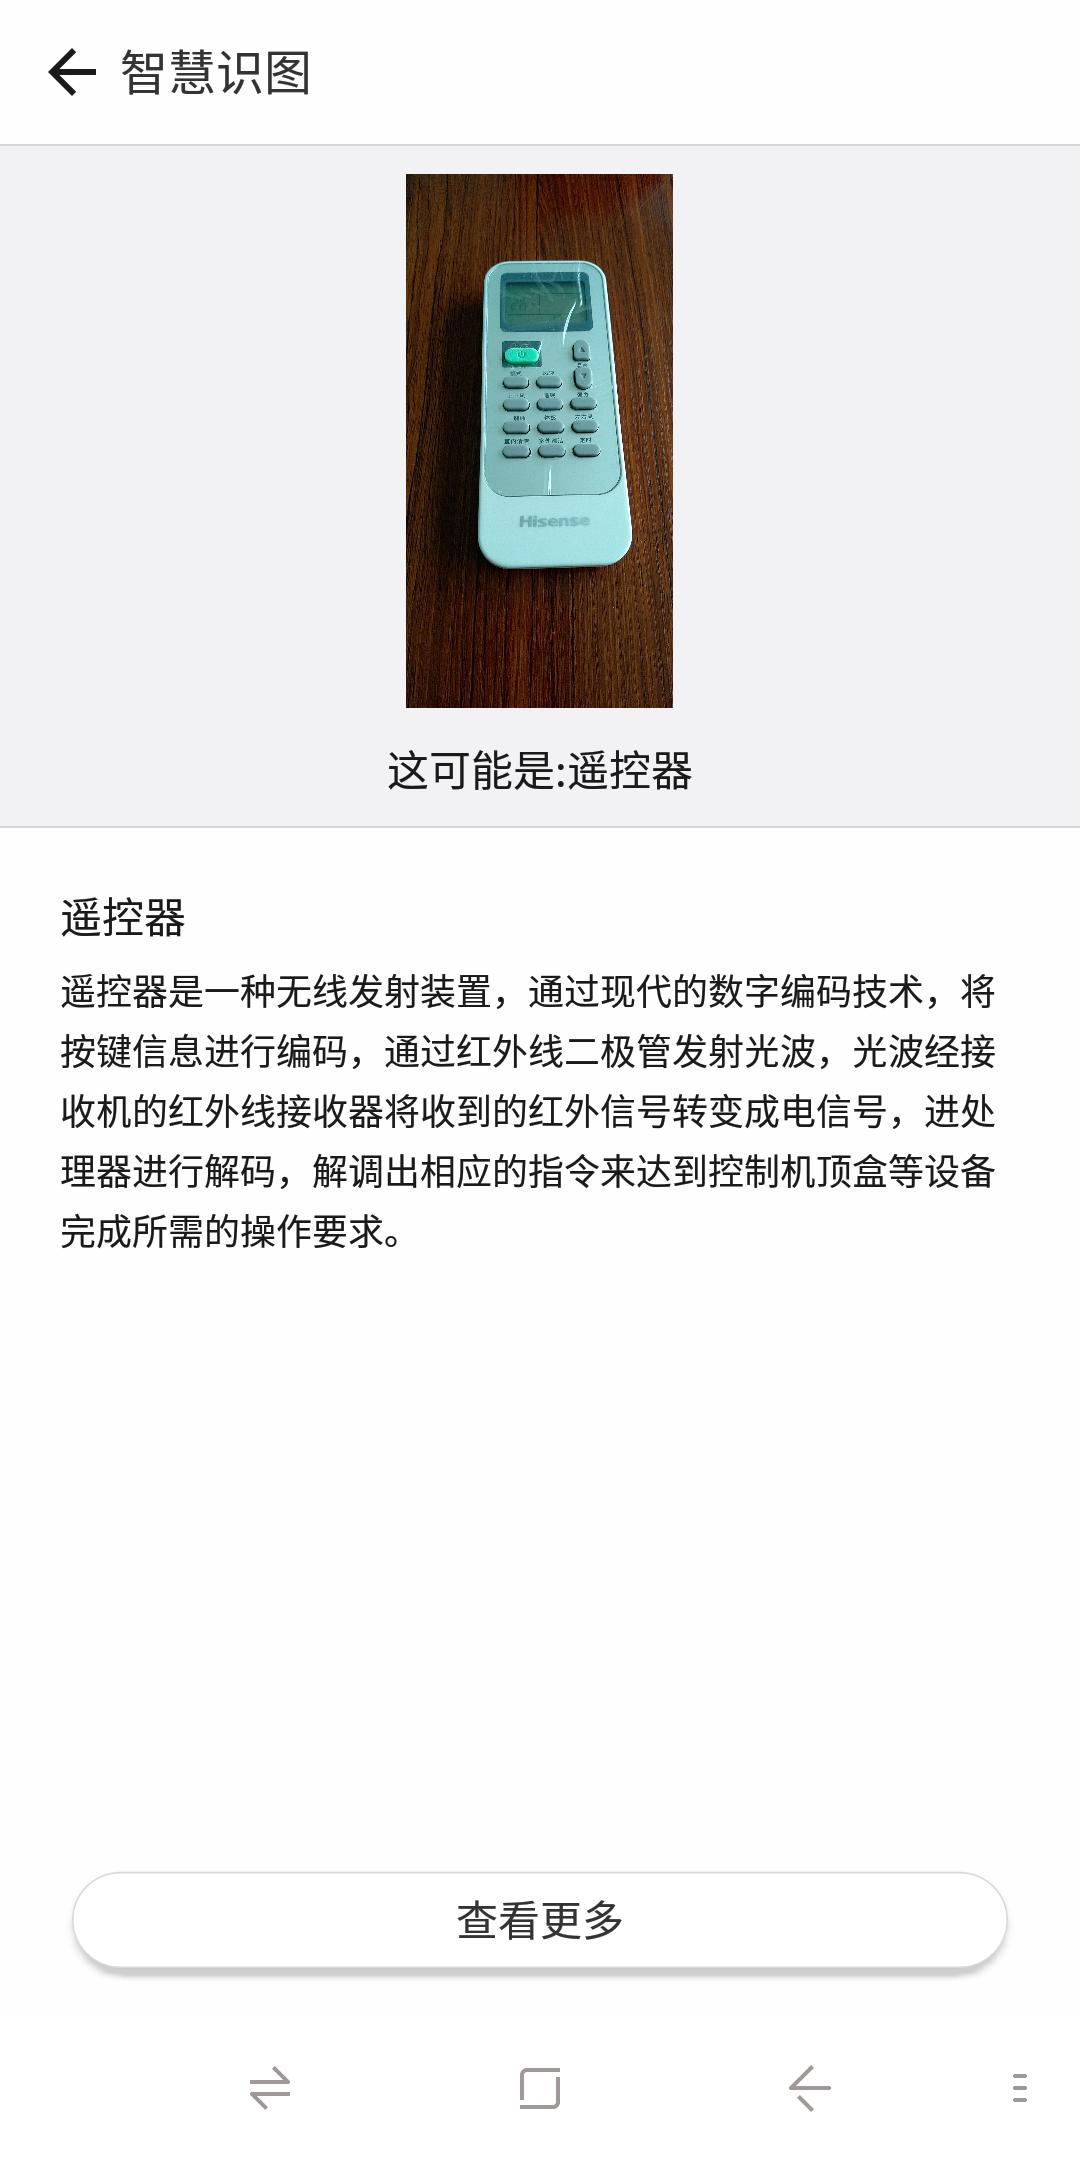 Screenshot_2018-08-21-15-27-00.png